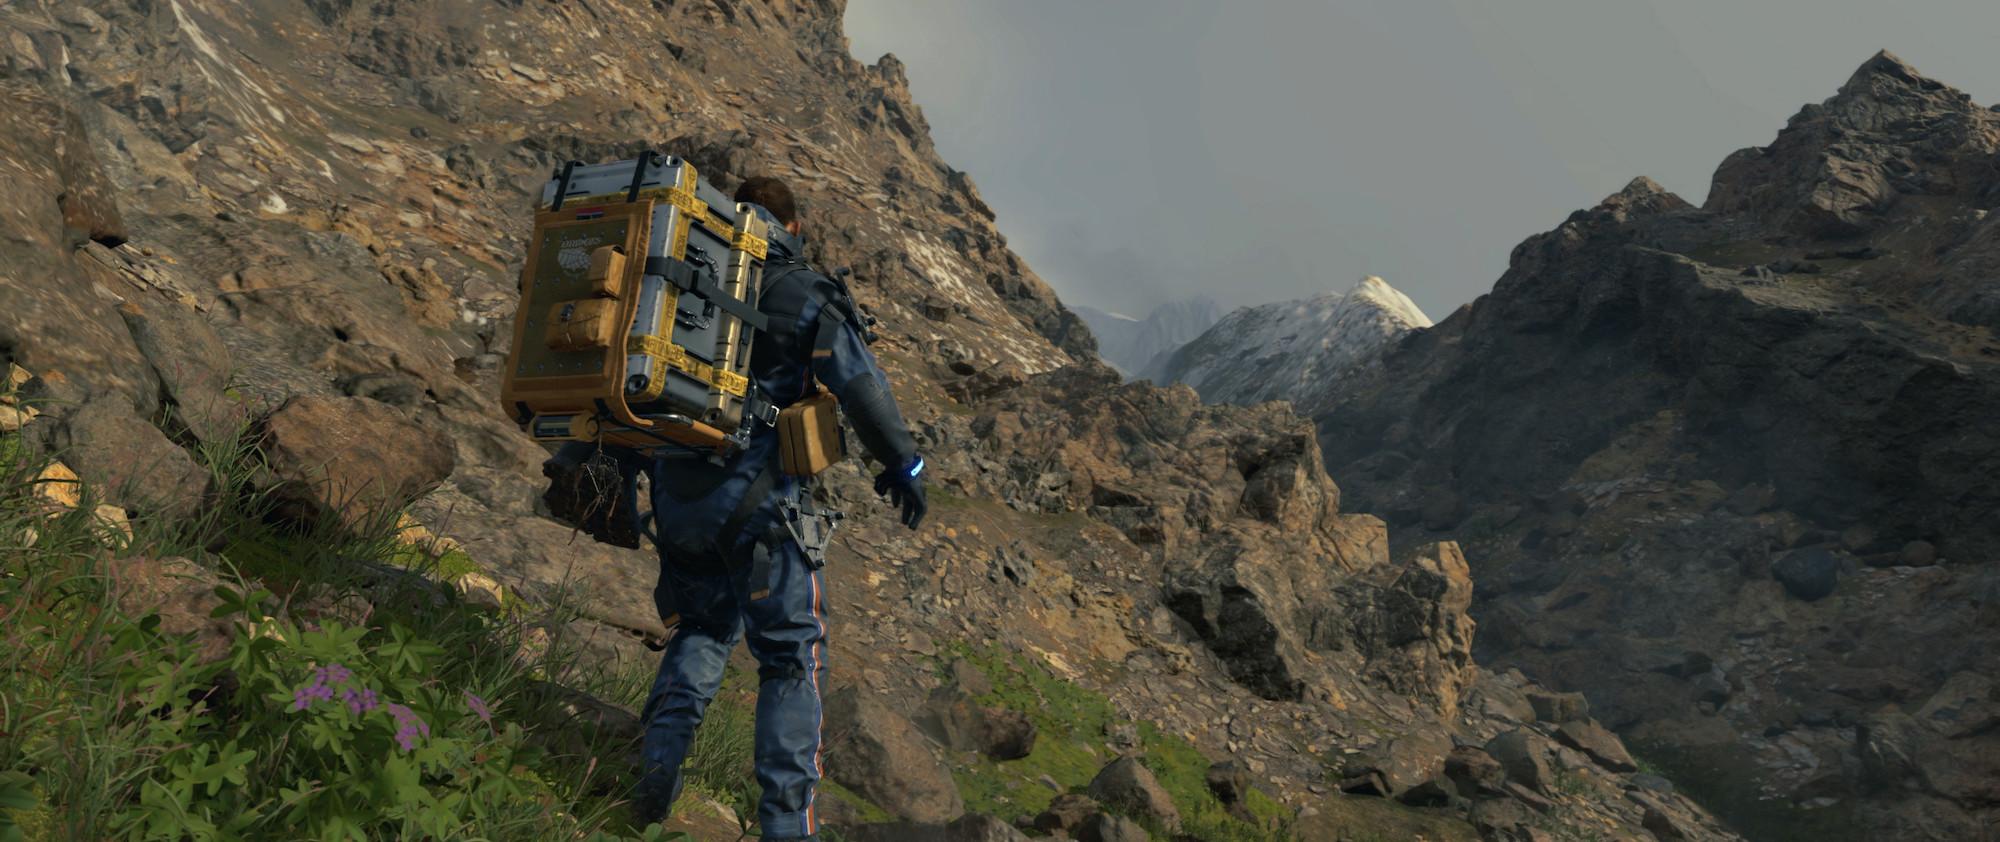 Death-Stranding digital PS4 game deals